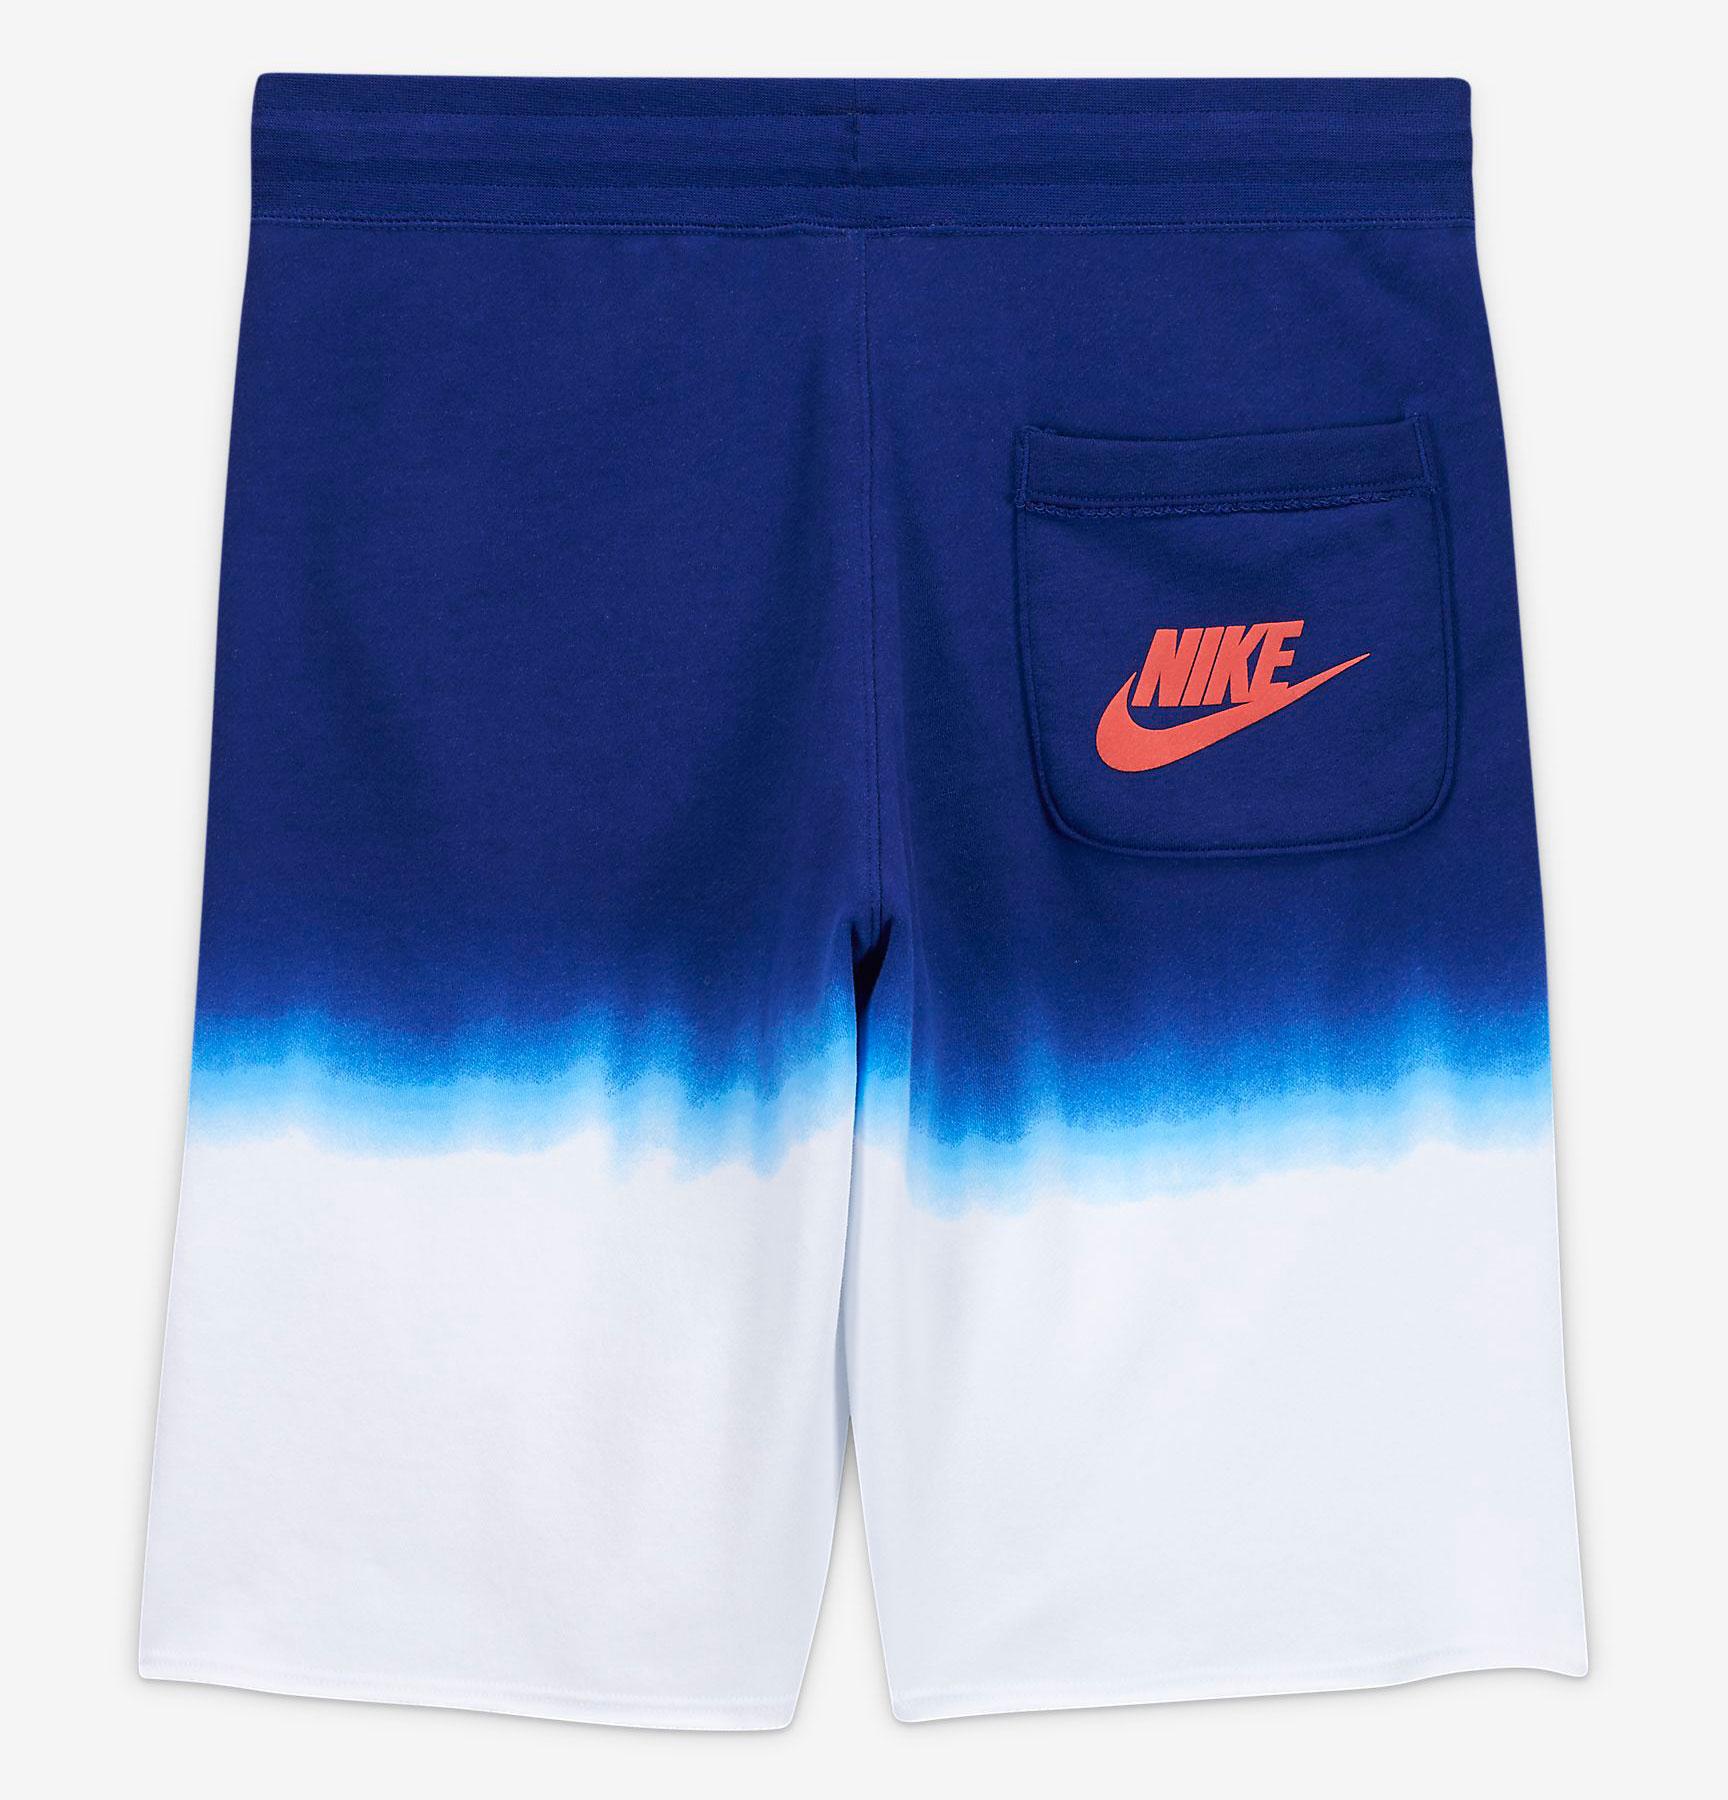 nike-americana-alumni-tie-dye-shorts-2